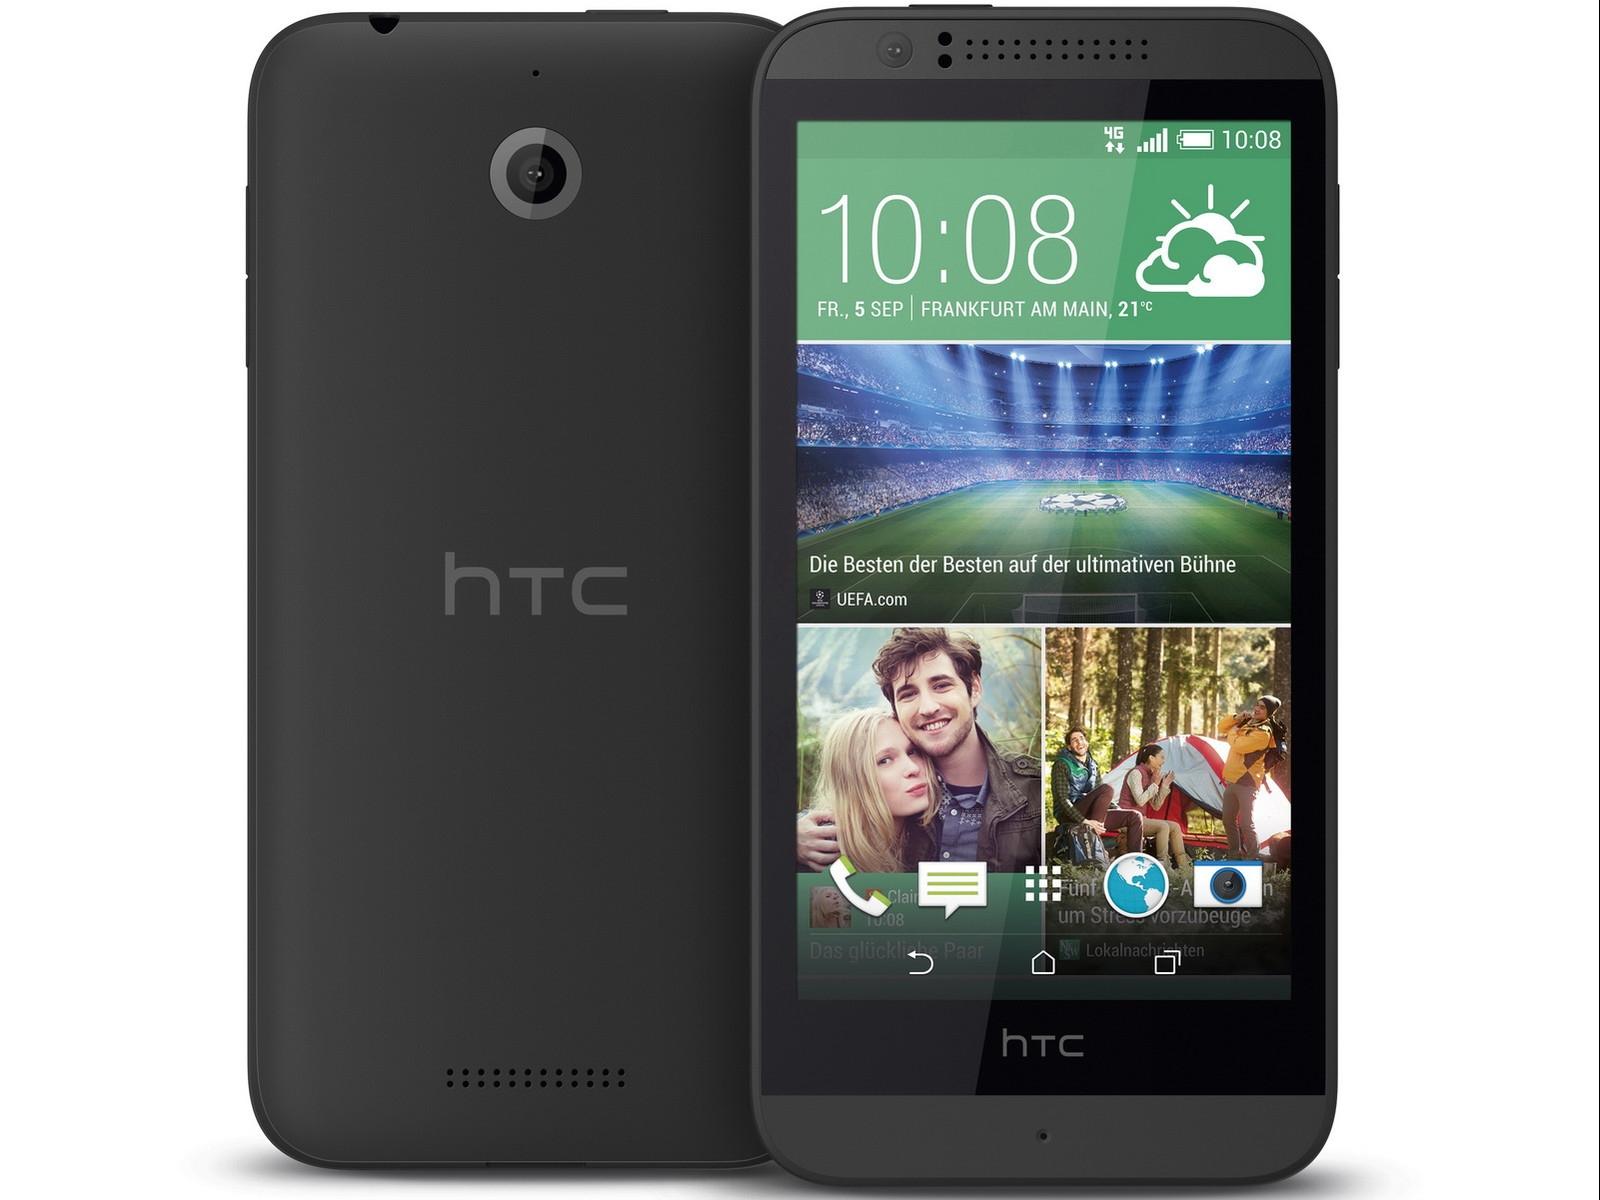 HTC Desire 510 Image